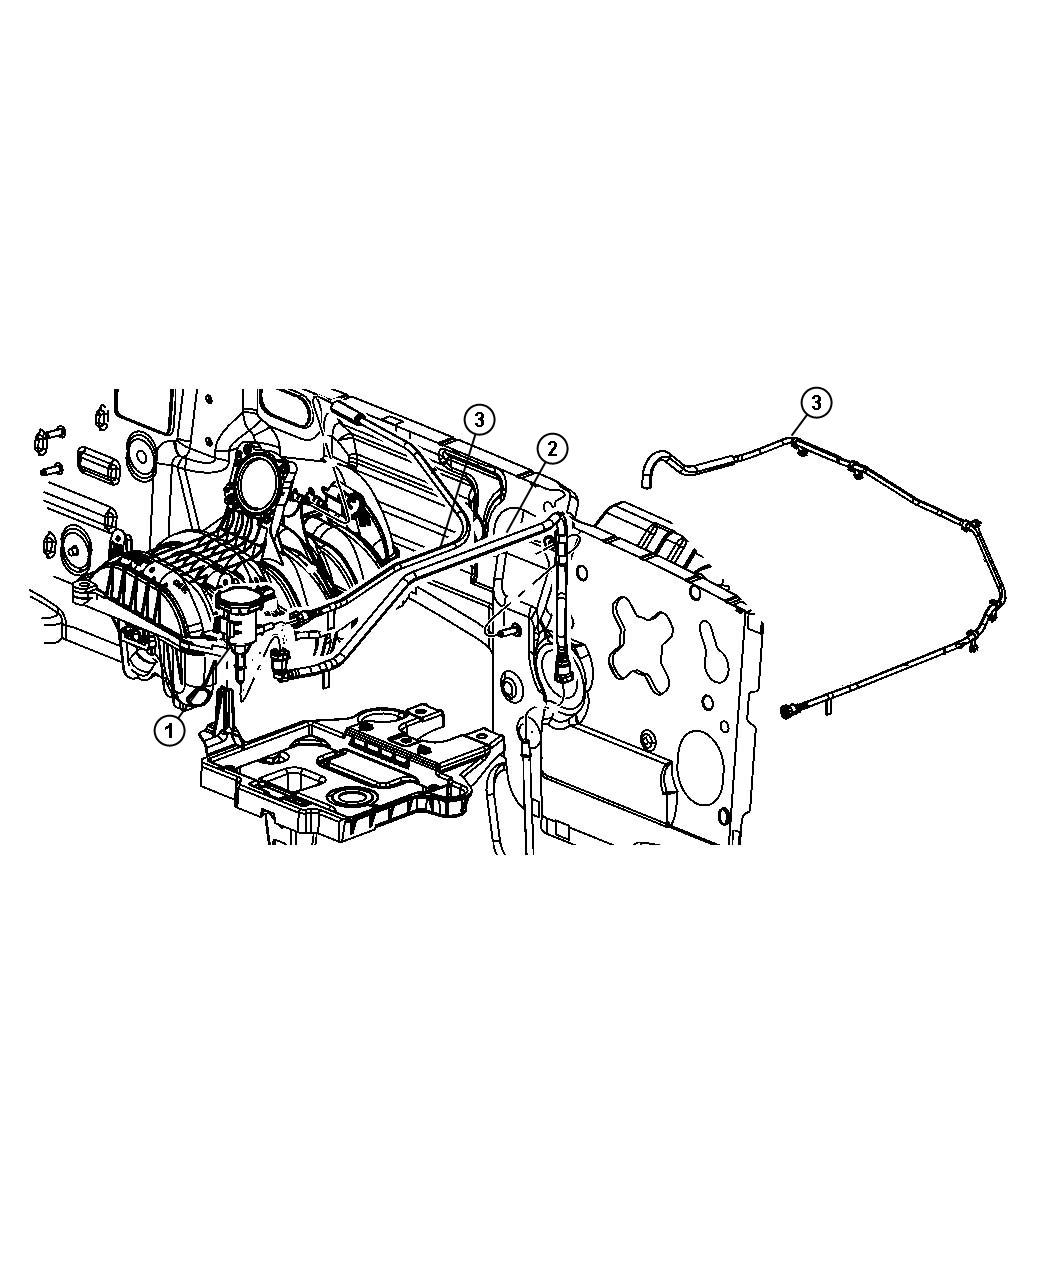 2008 Jeep Liberty Tube  Fuel Vapor  Throttle Body Purge